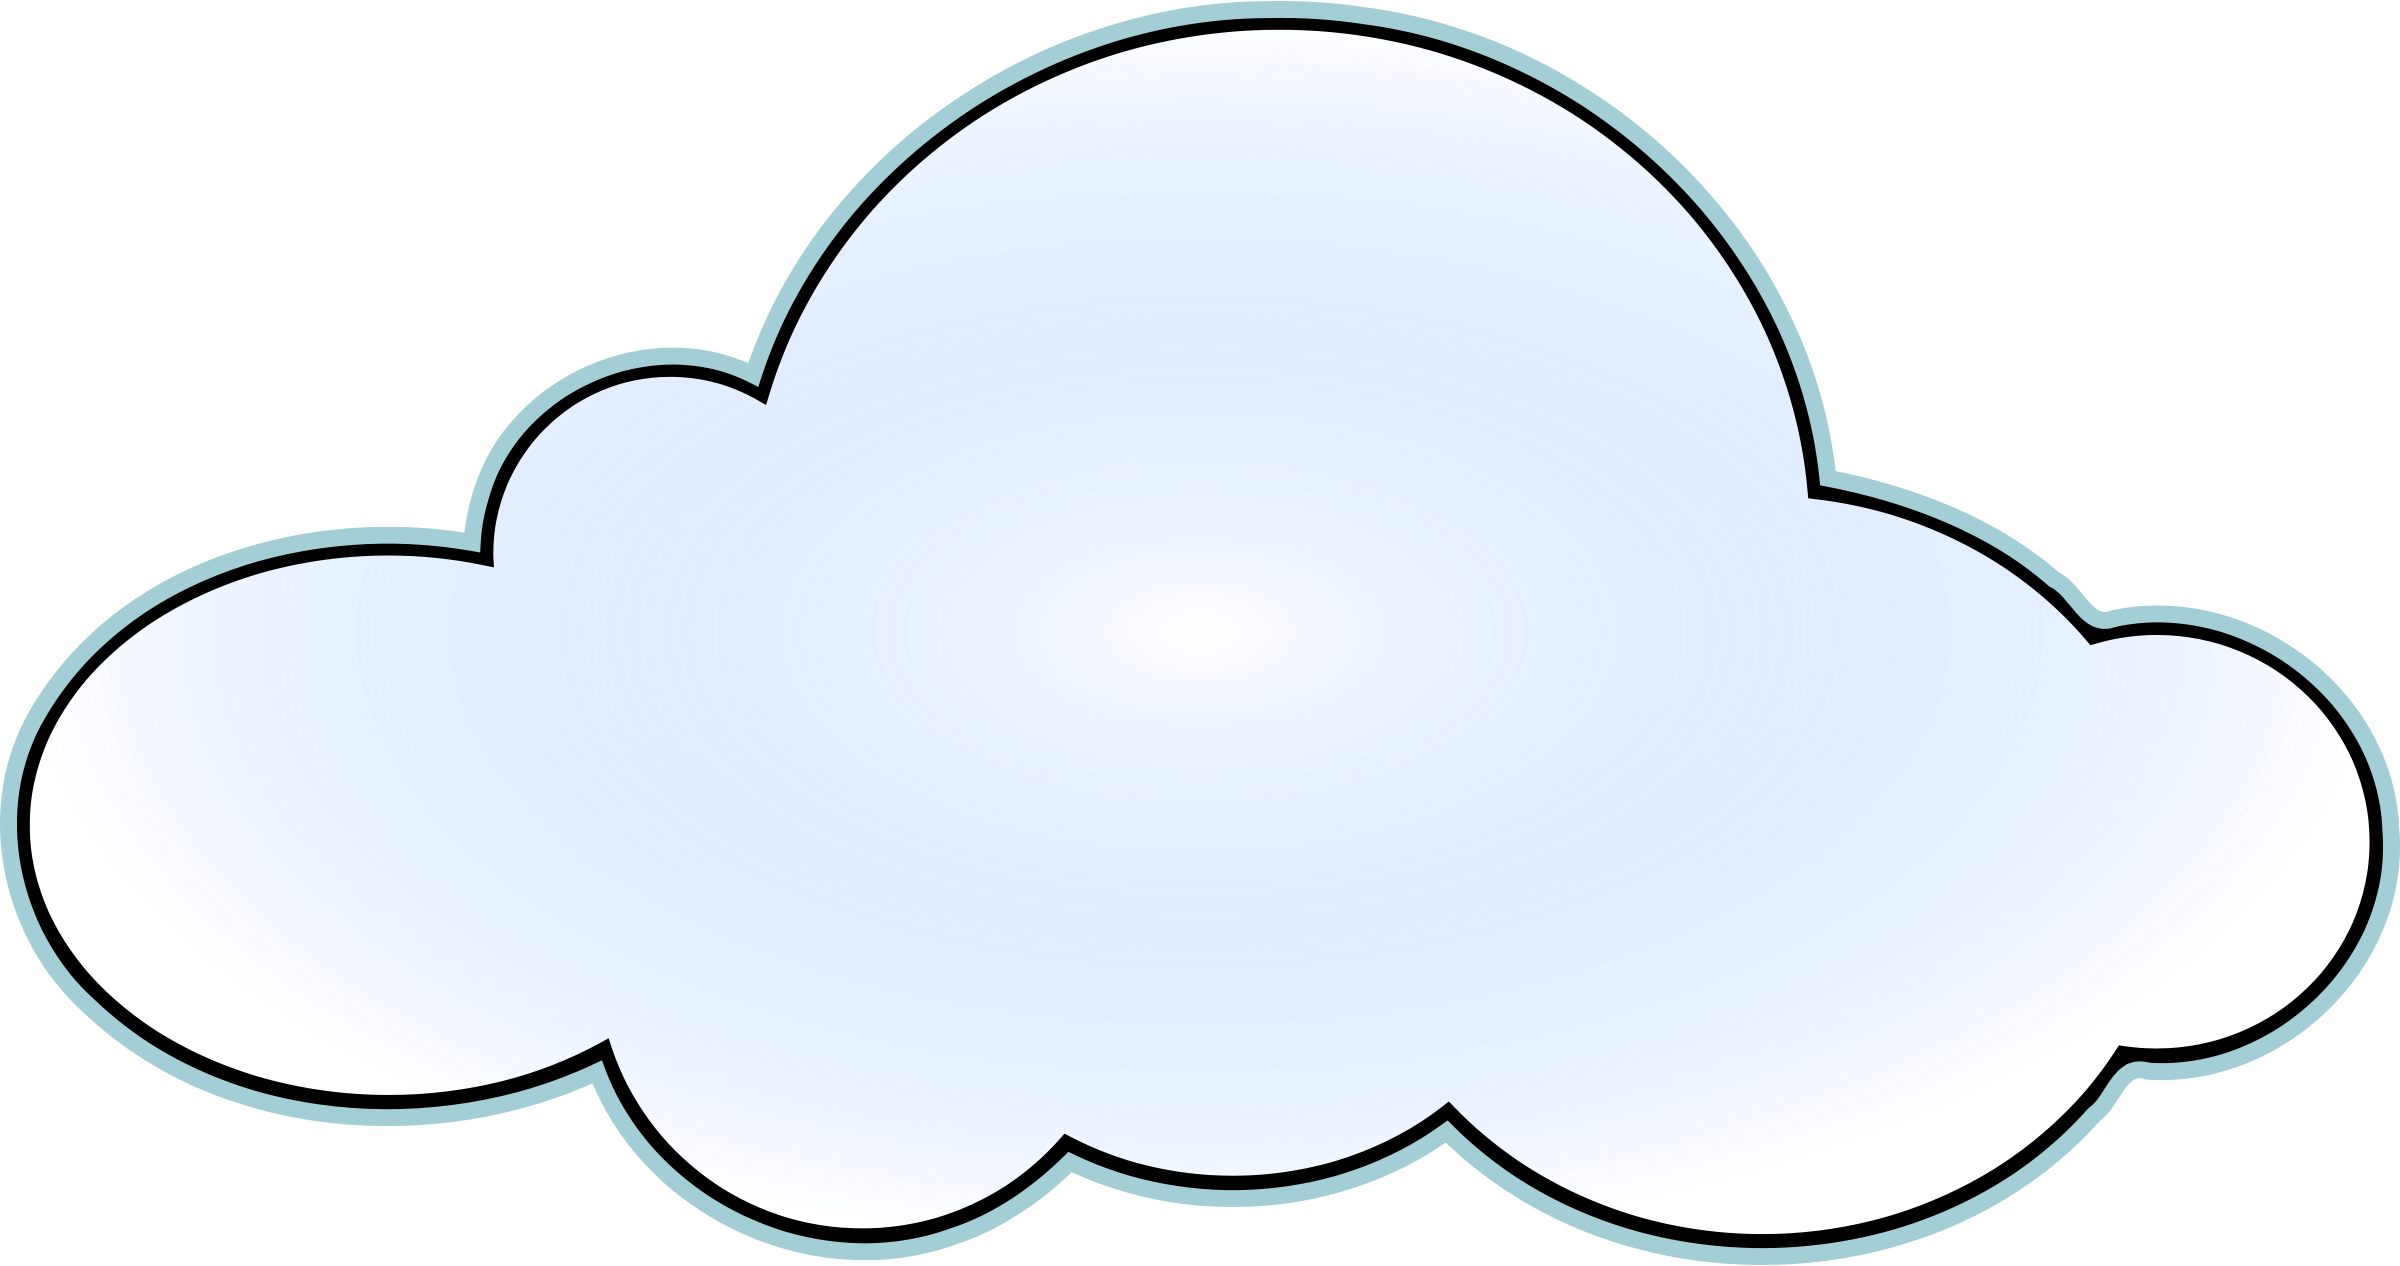 2400x1266 Image Of Cloud Clip Art